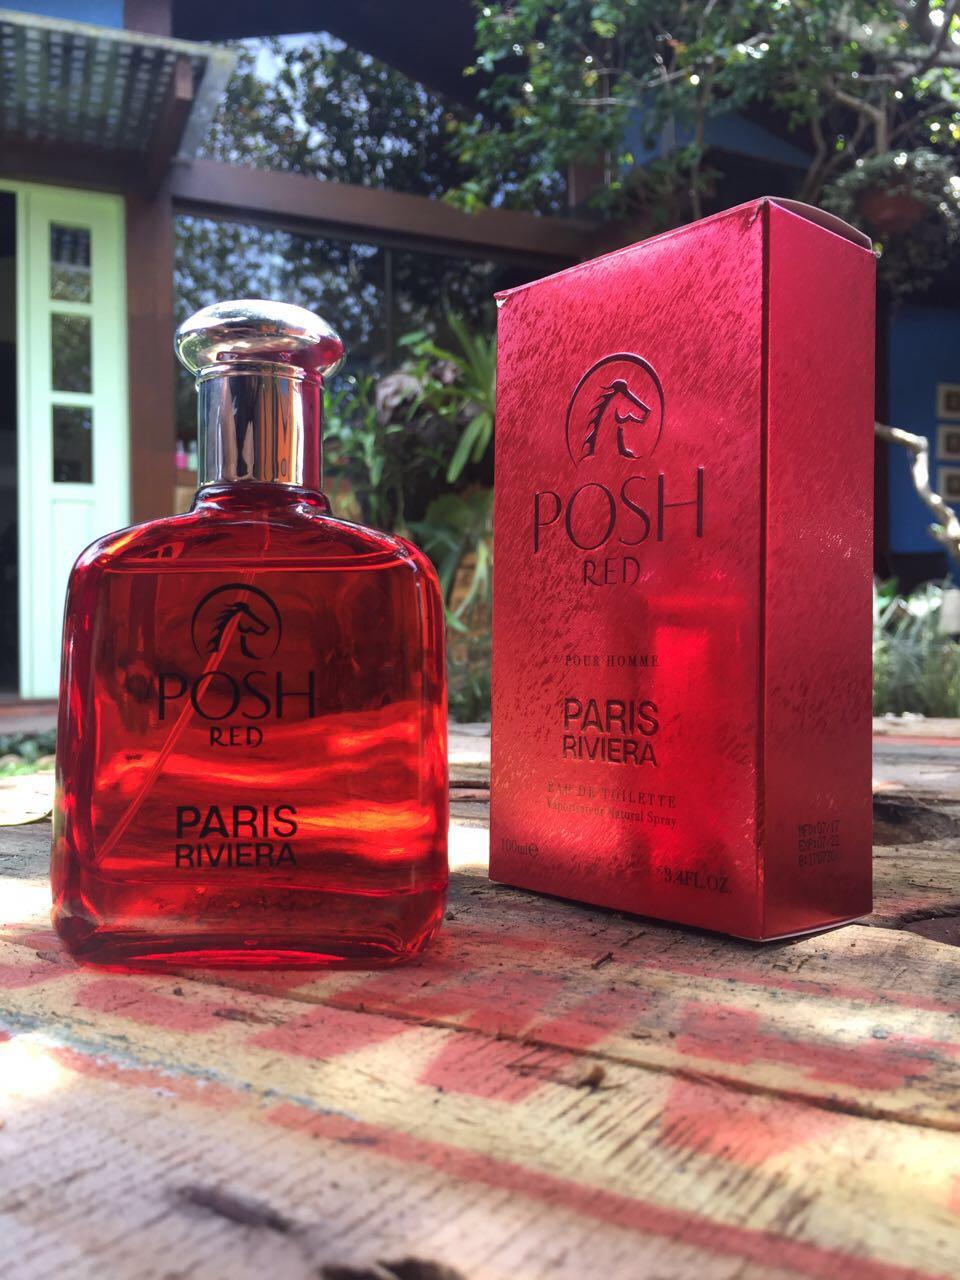 Posh Red Paris Riviera - Perfume Masculino EDT - 100ml